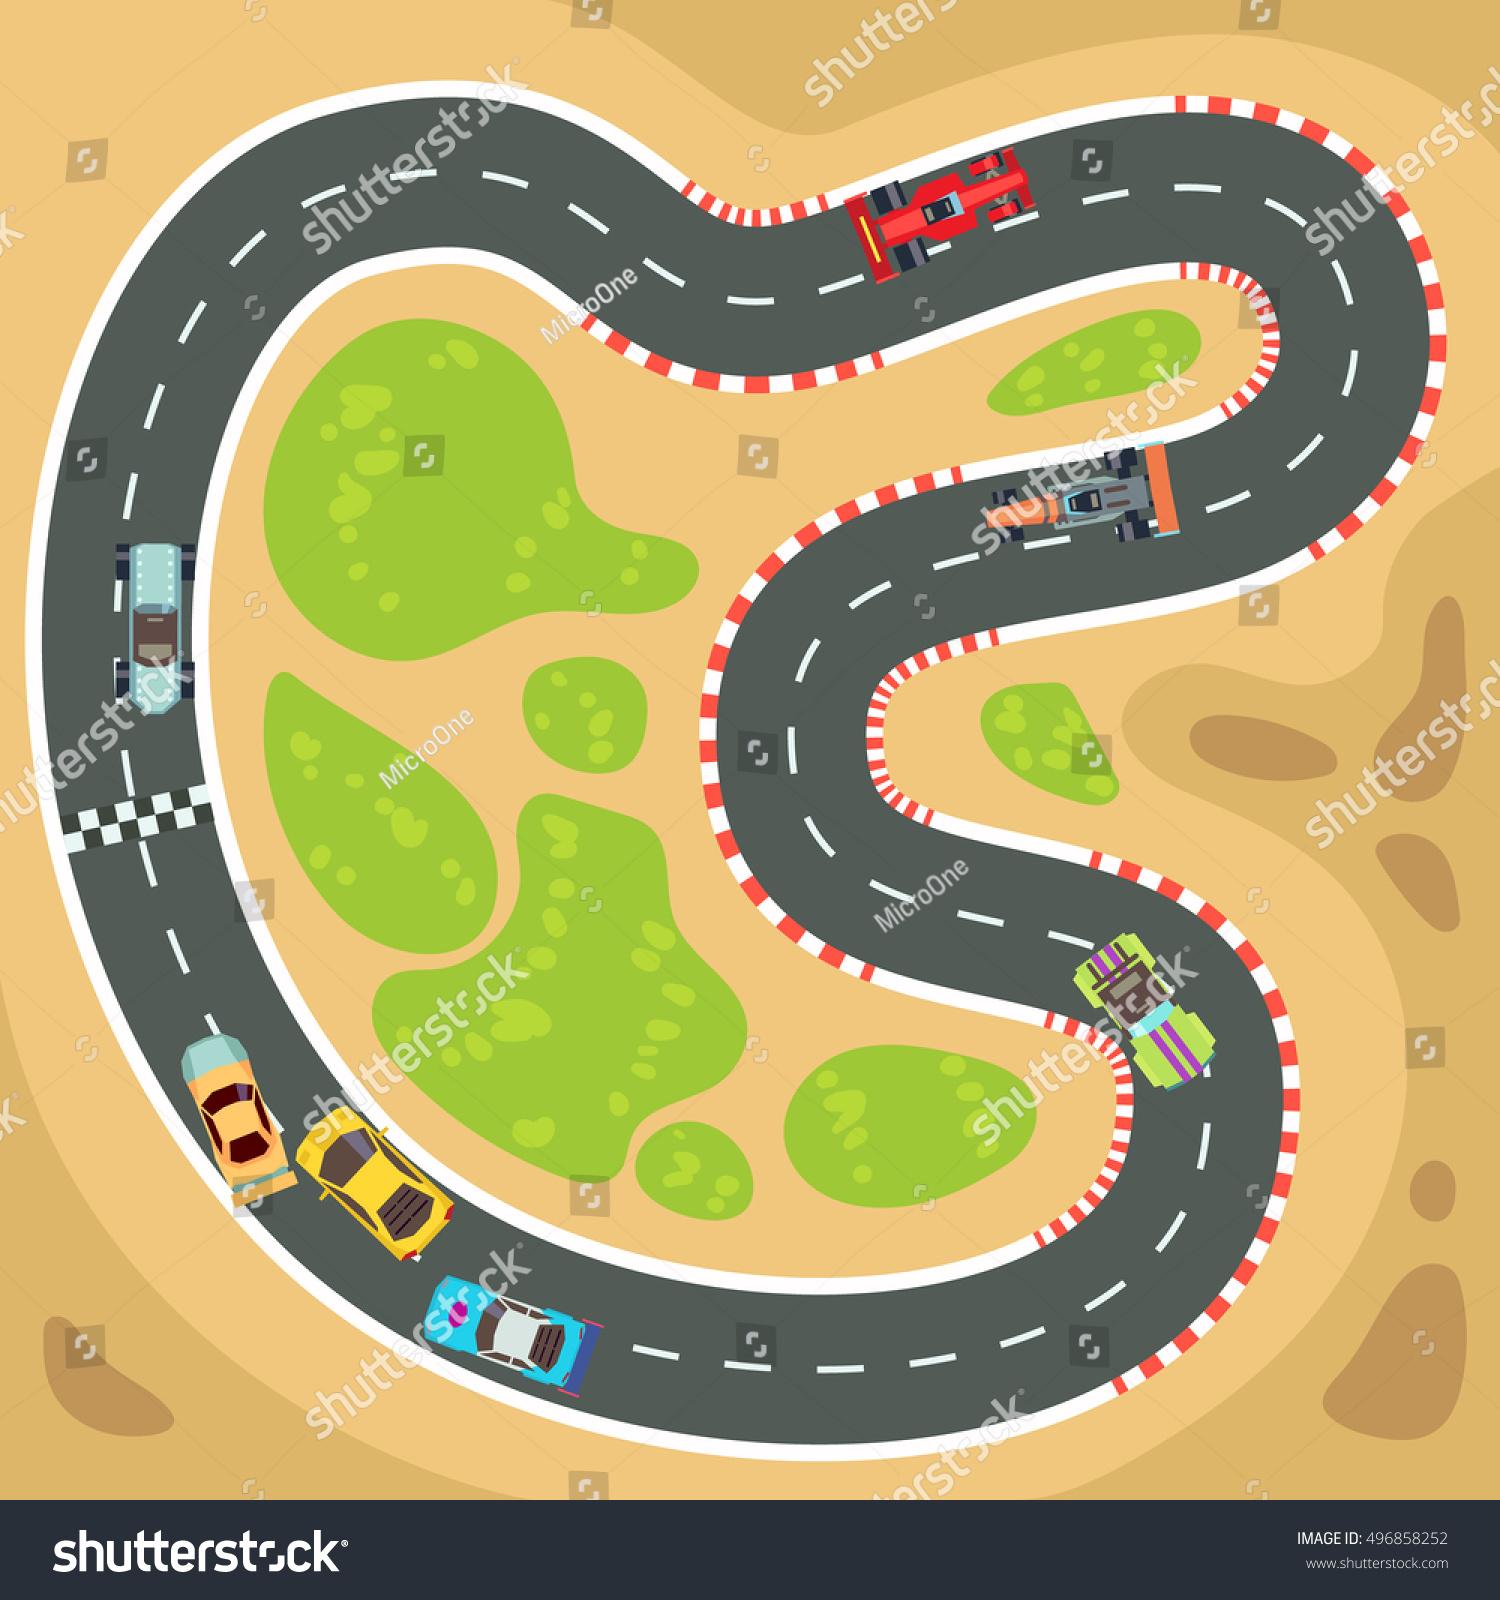 Shutterstock Race Car Track